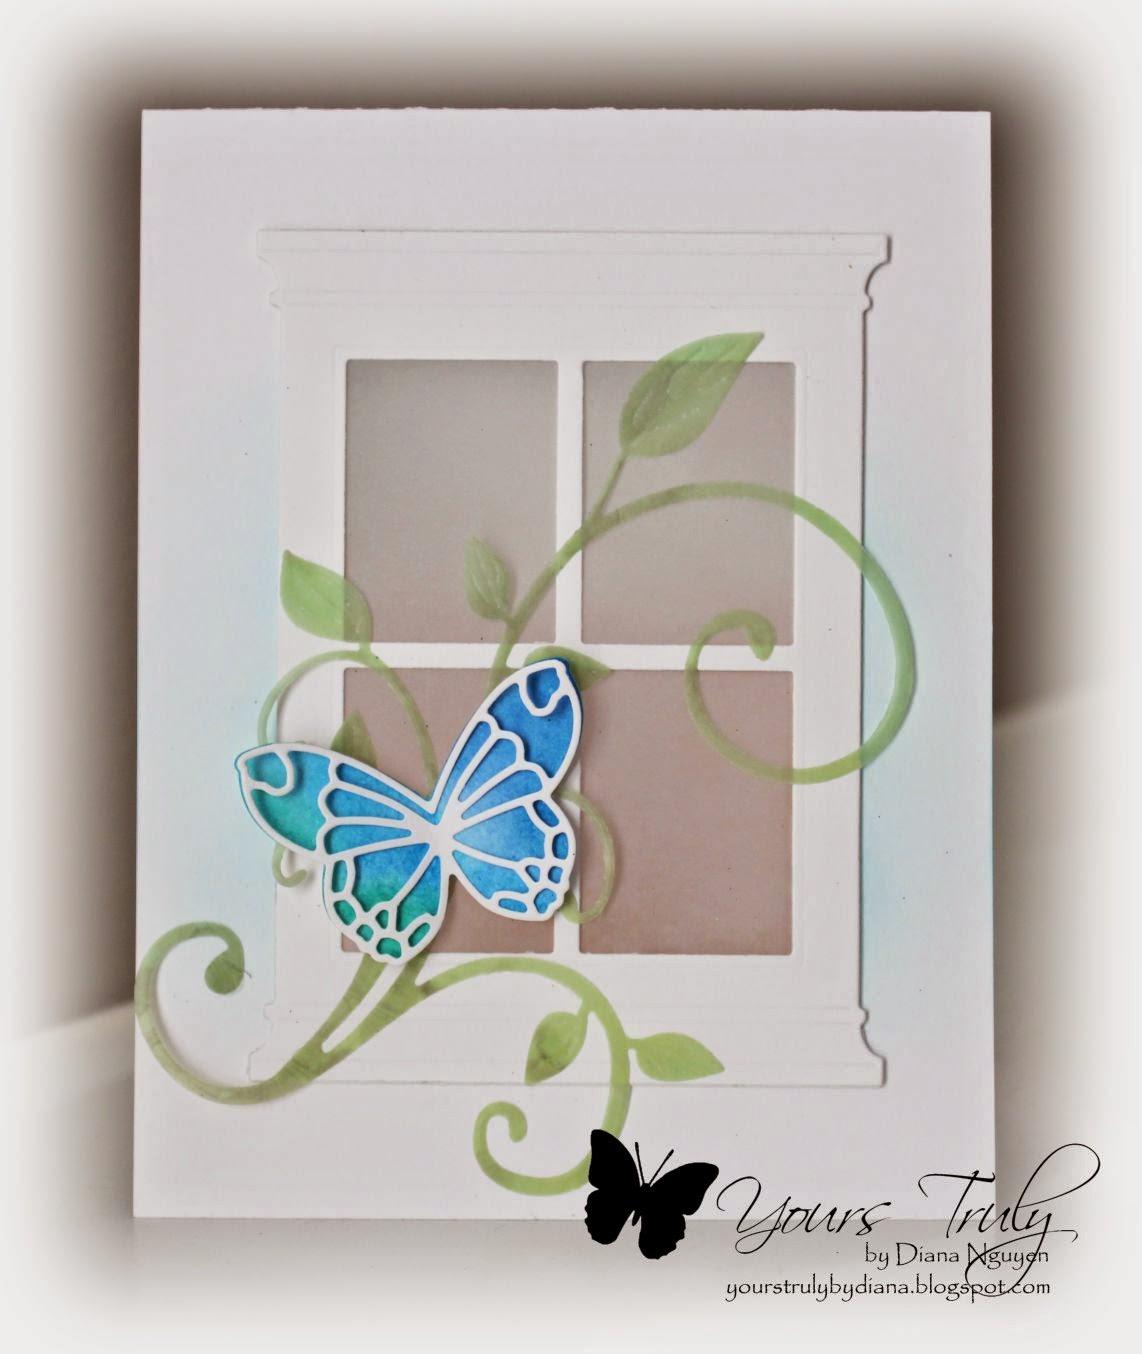 Diana Nguyen, Poppystamps, Butterfly, card